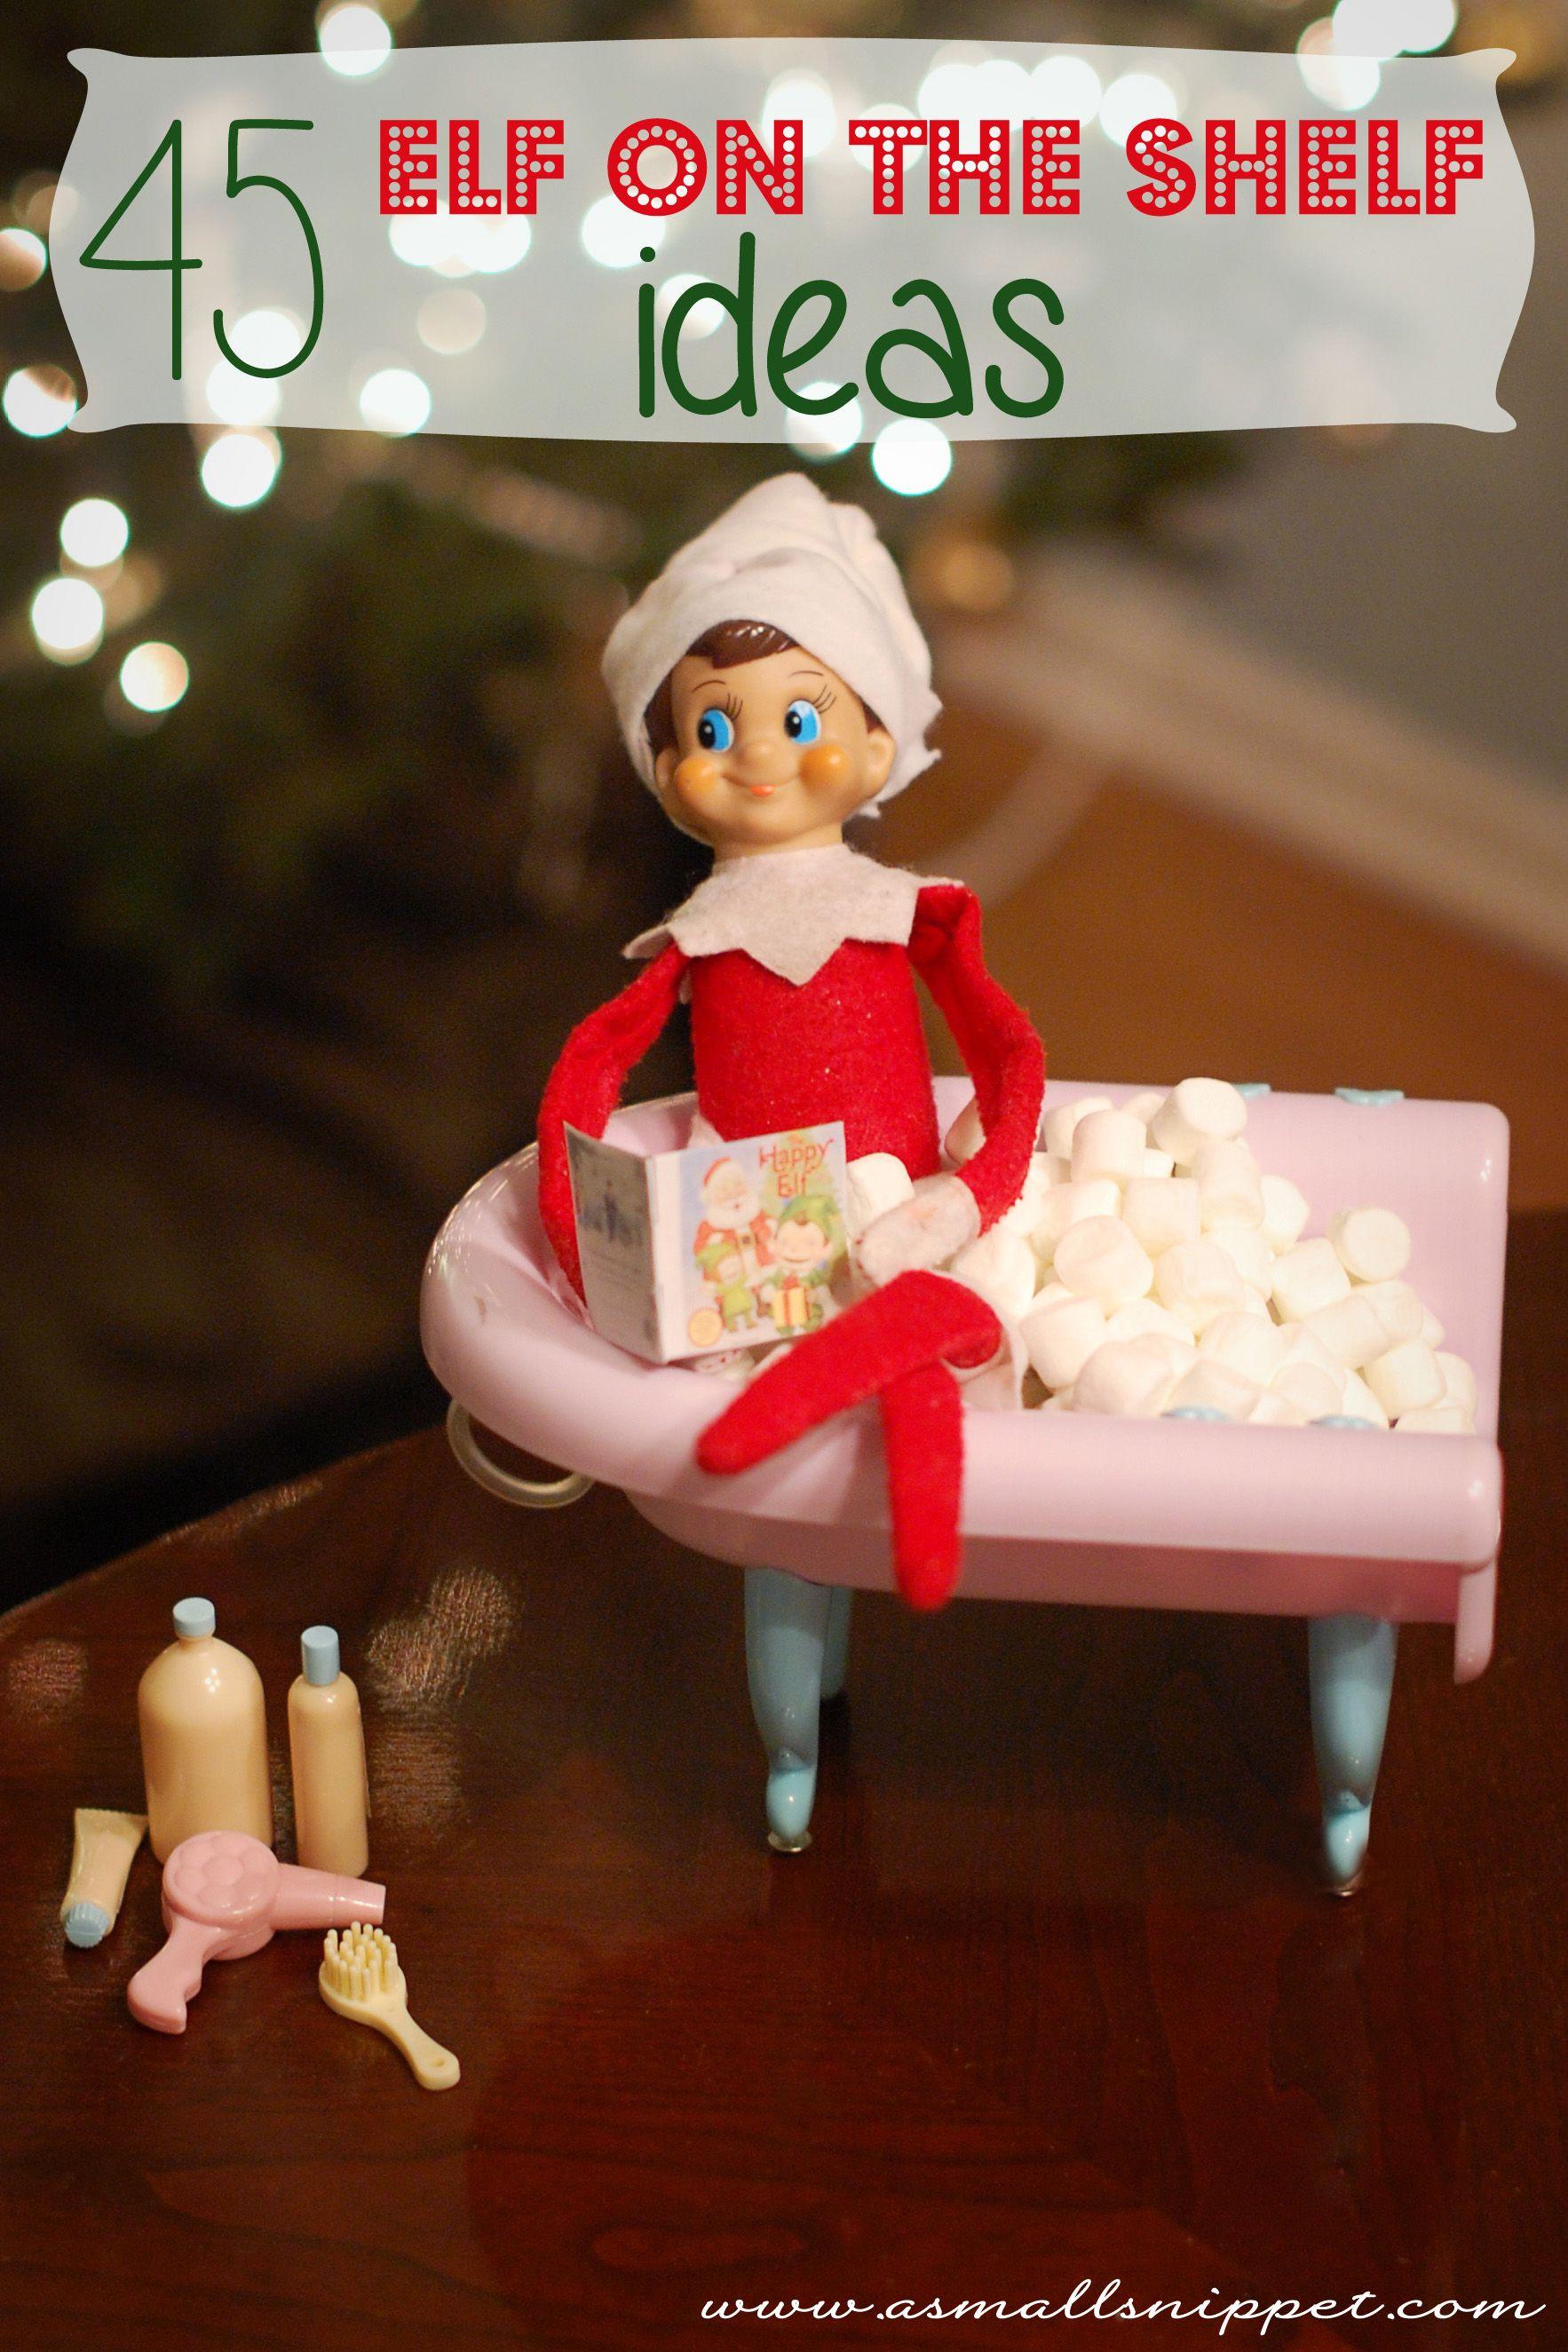 45 Elf on the Shelf Ideas (from the same Elf!) Elf on